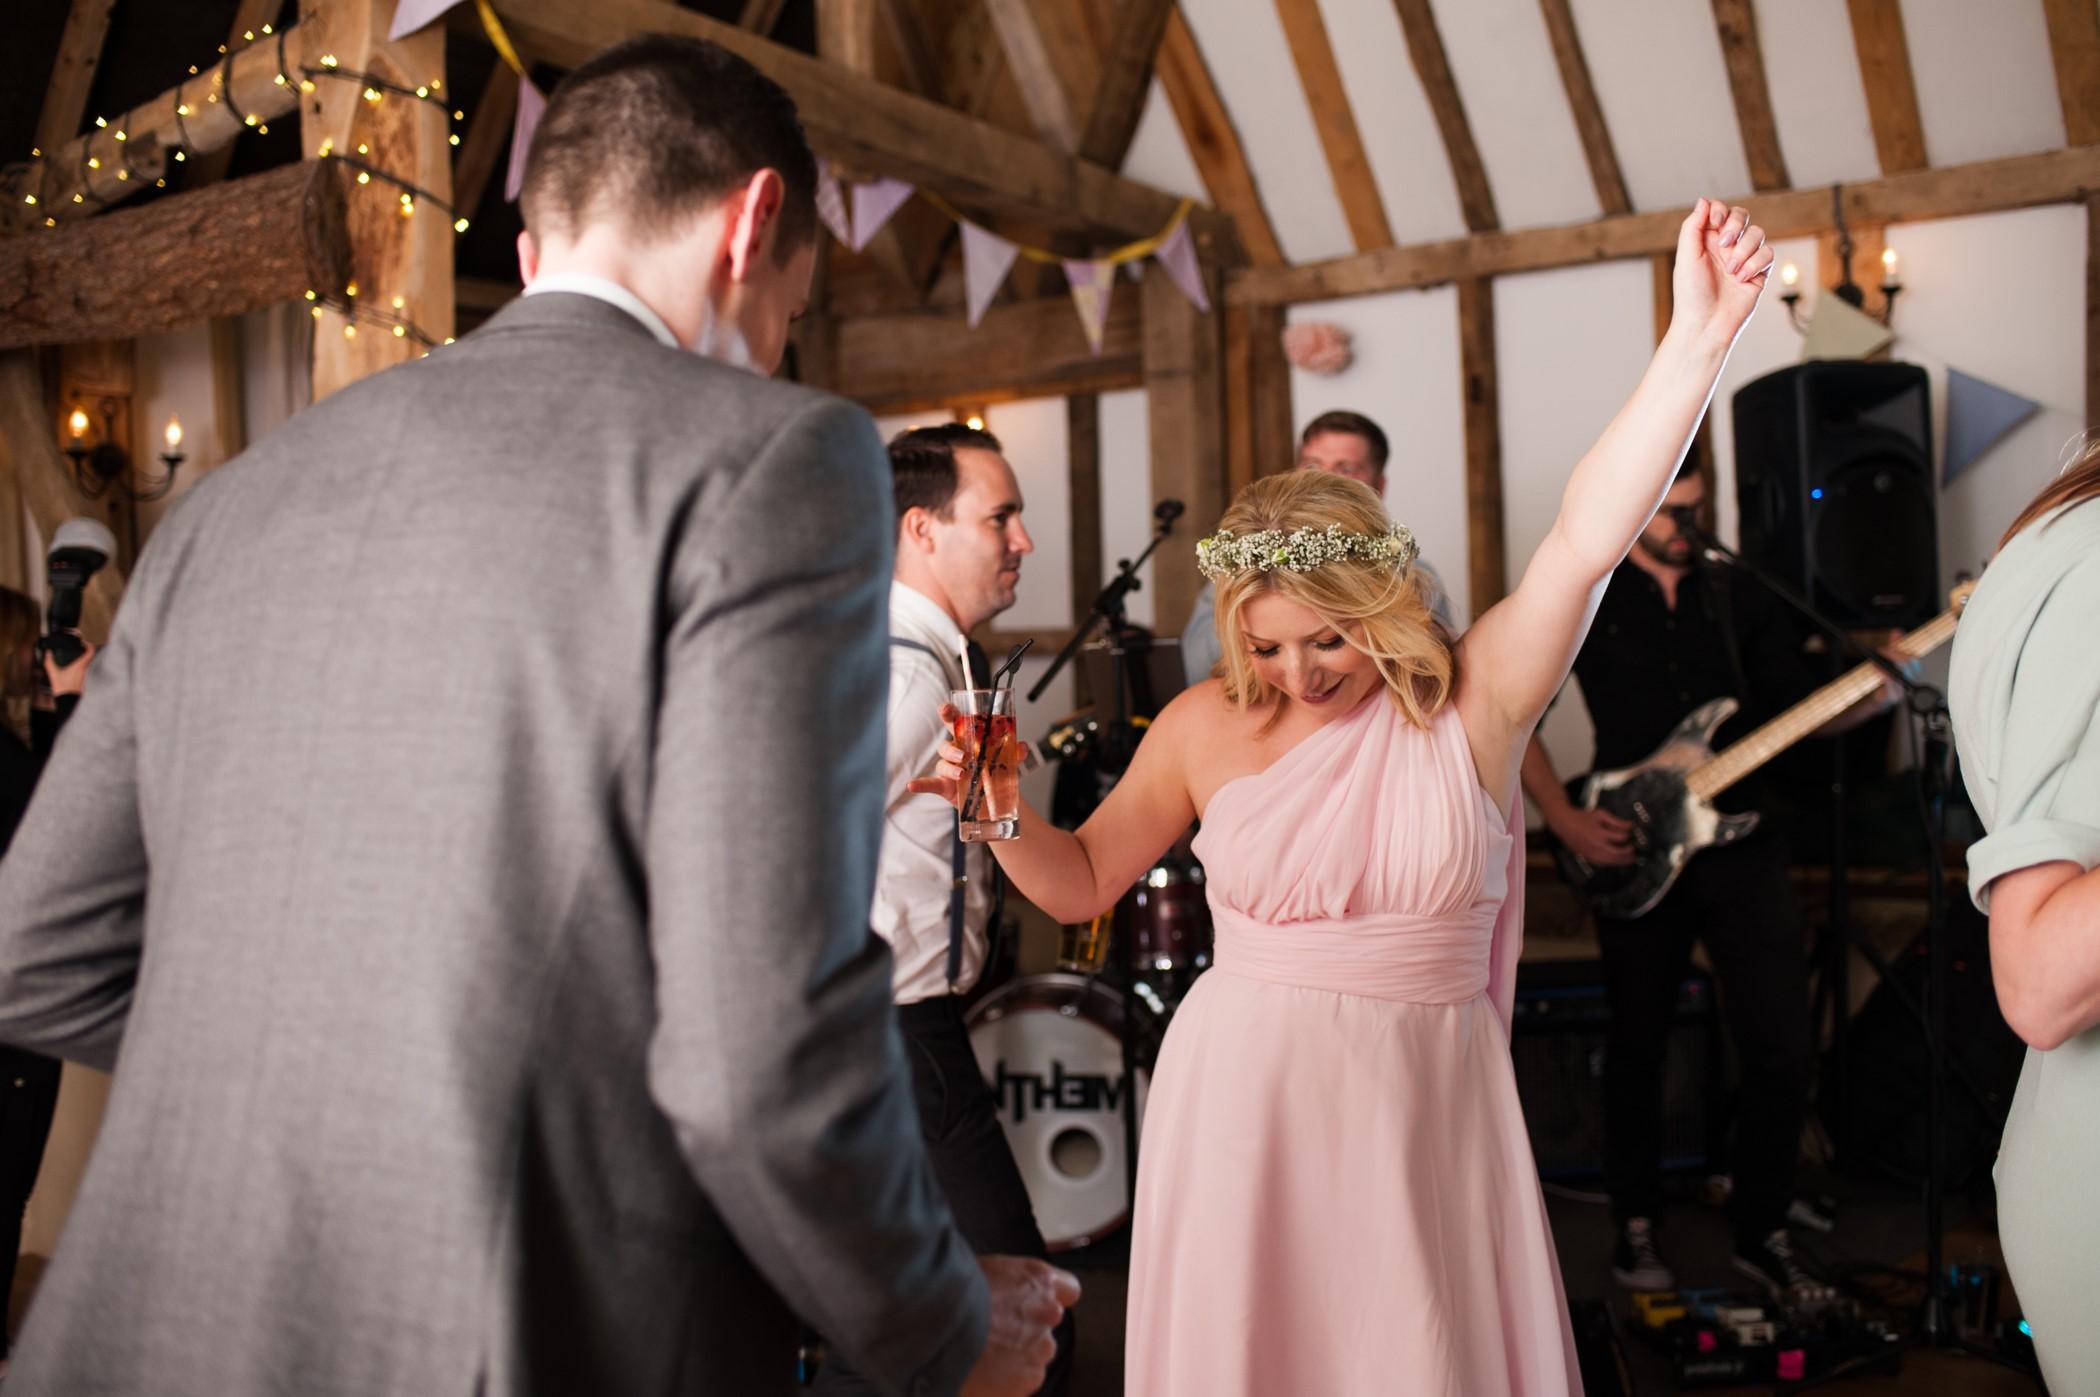 Anthem wedding band